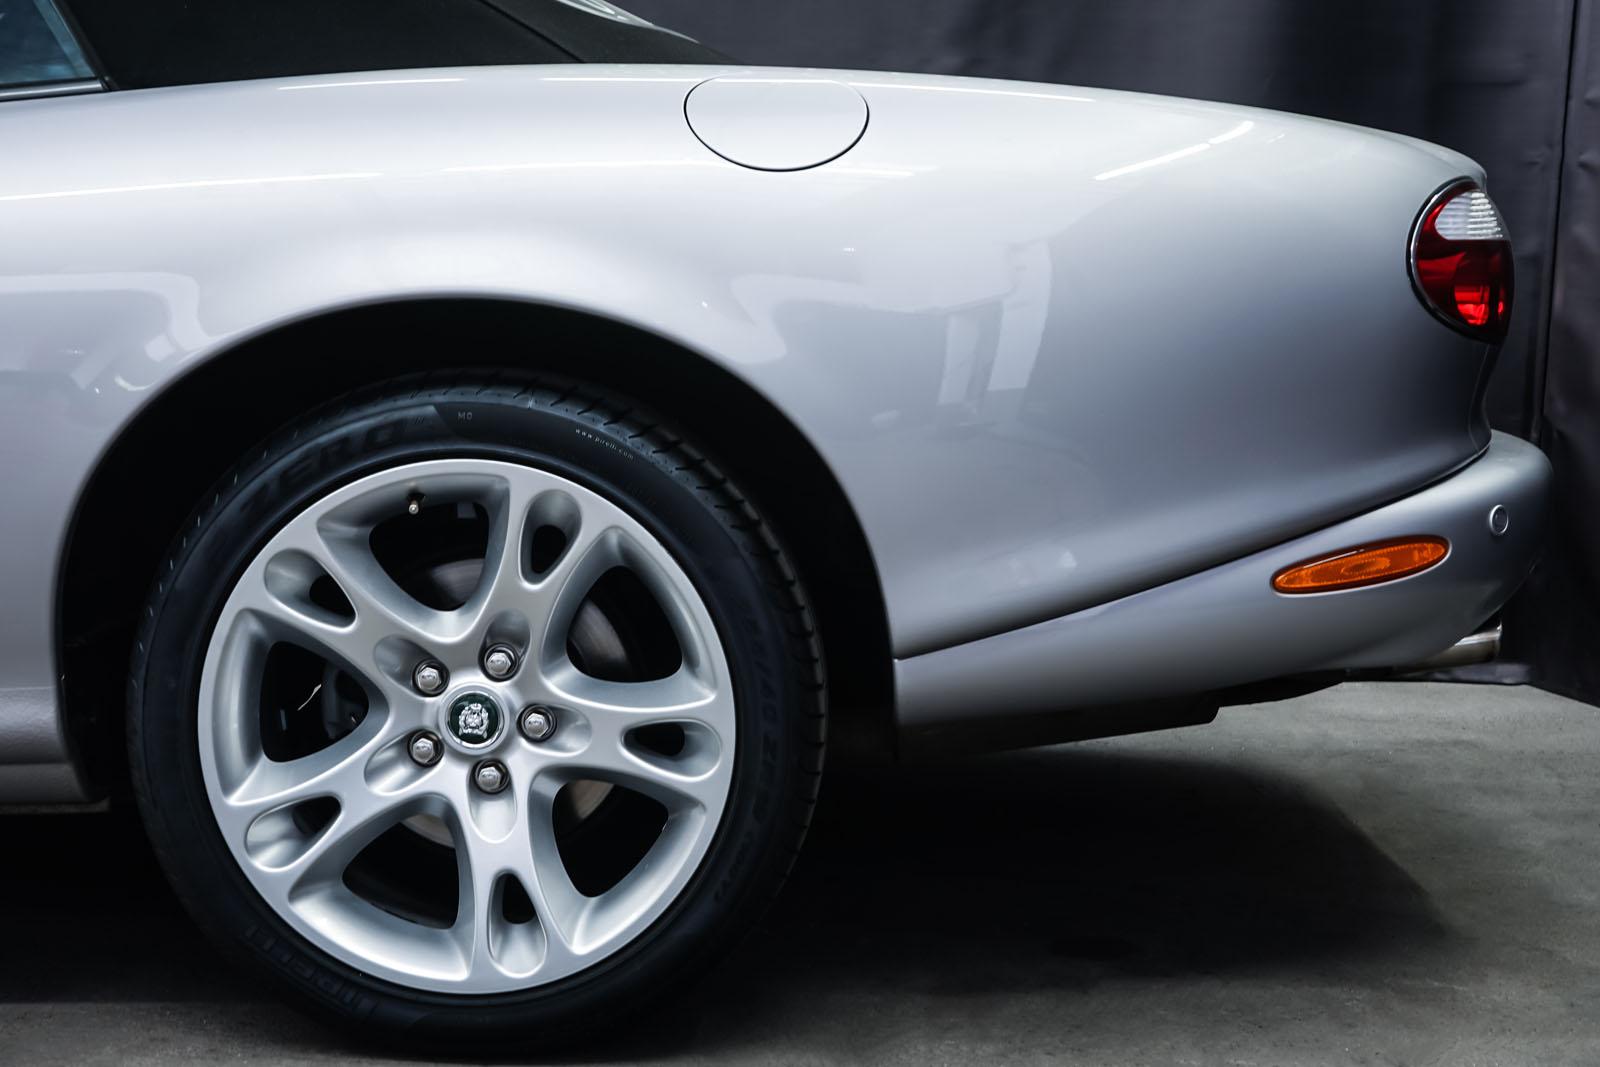 Jaguar_XK8_4.0_Silber_Schwarz_JAG-9731_4_w